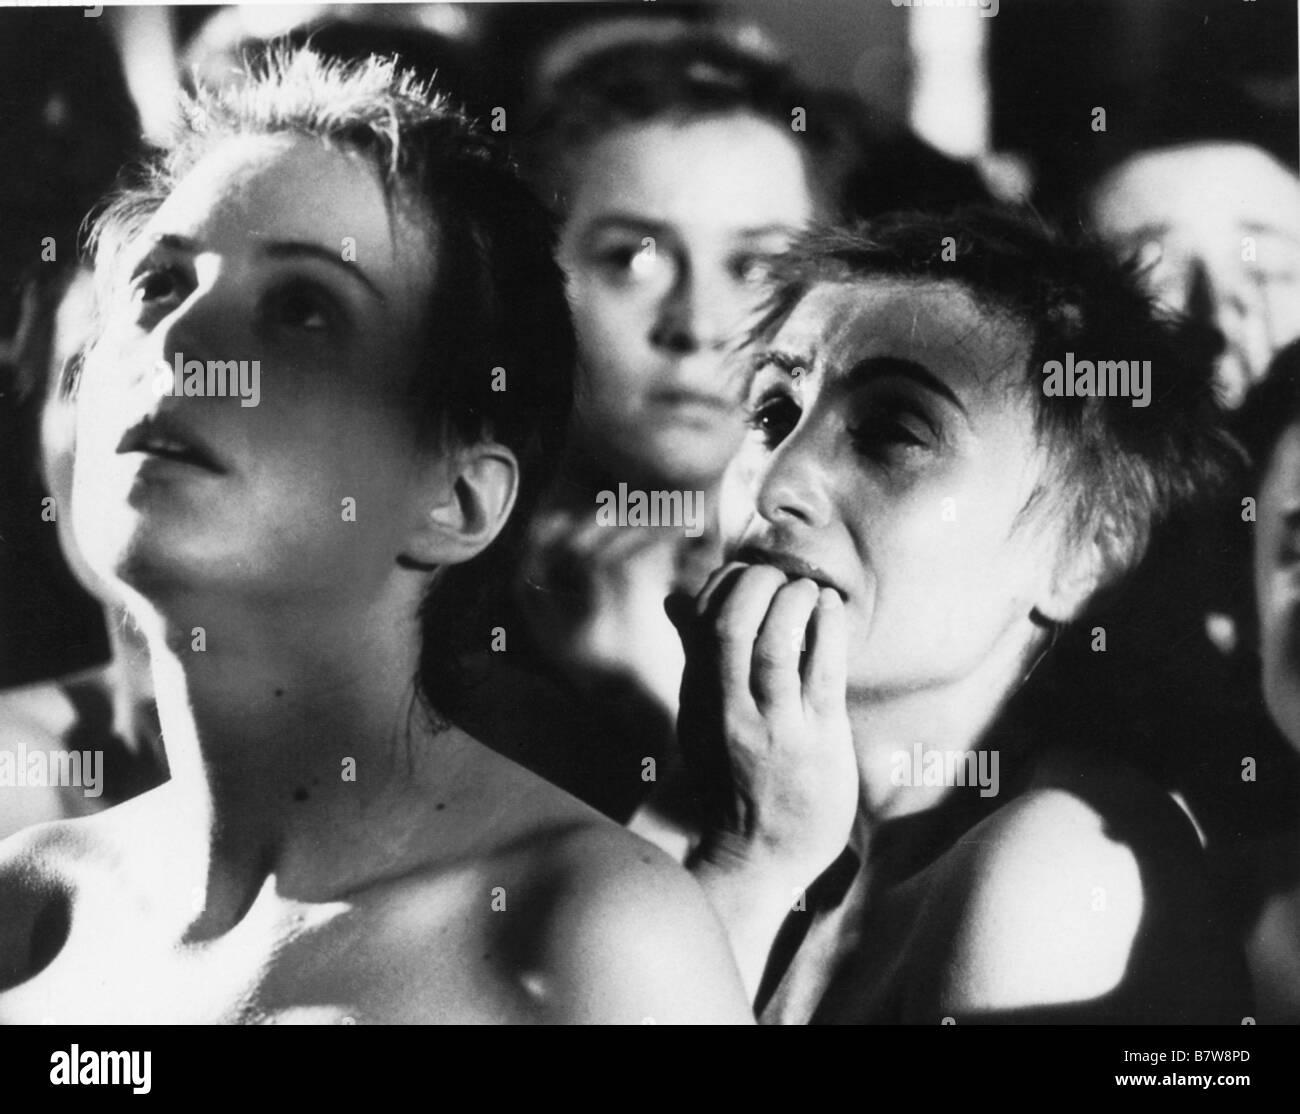 Schindler's List  Year: 1993 USA Director: Steven Spielberg - Stock Image